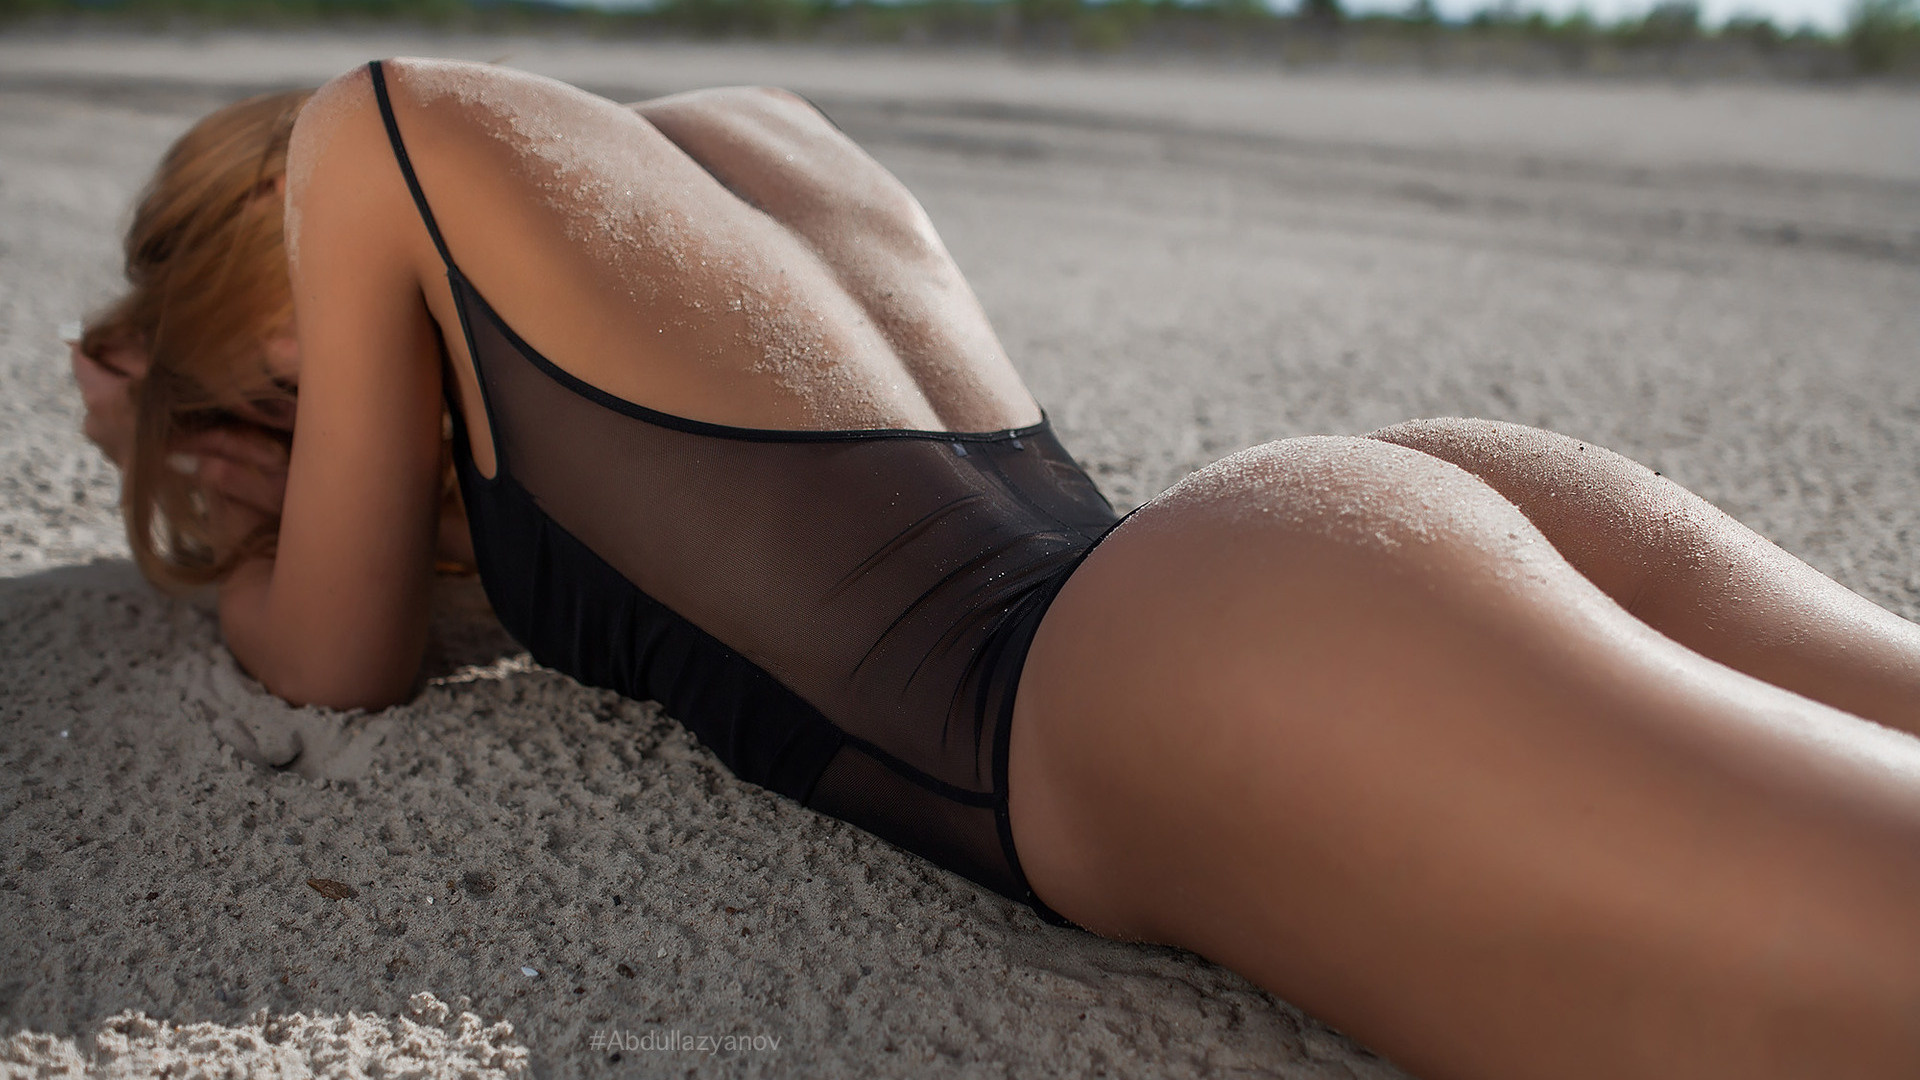 Big ass squat bikini, black hair, long hair